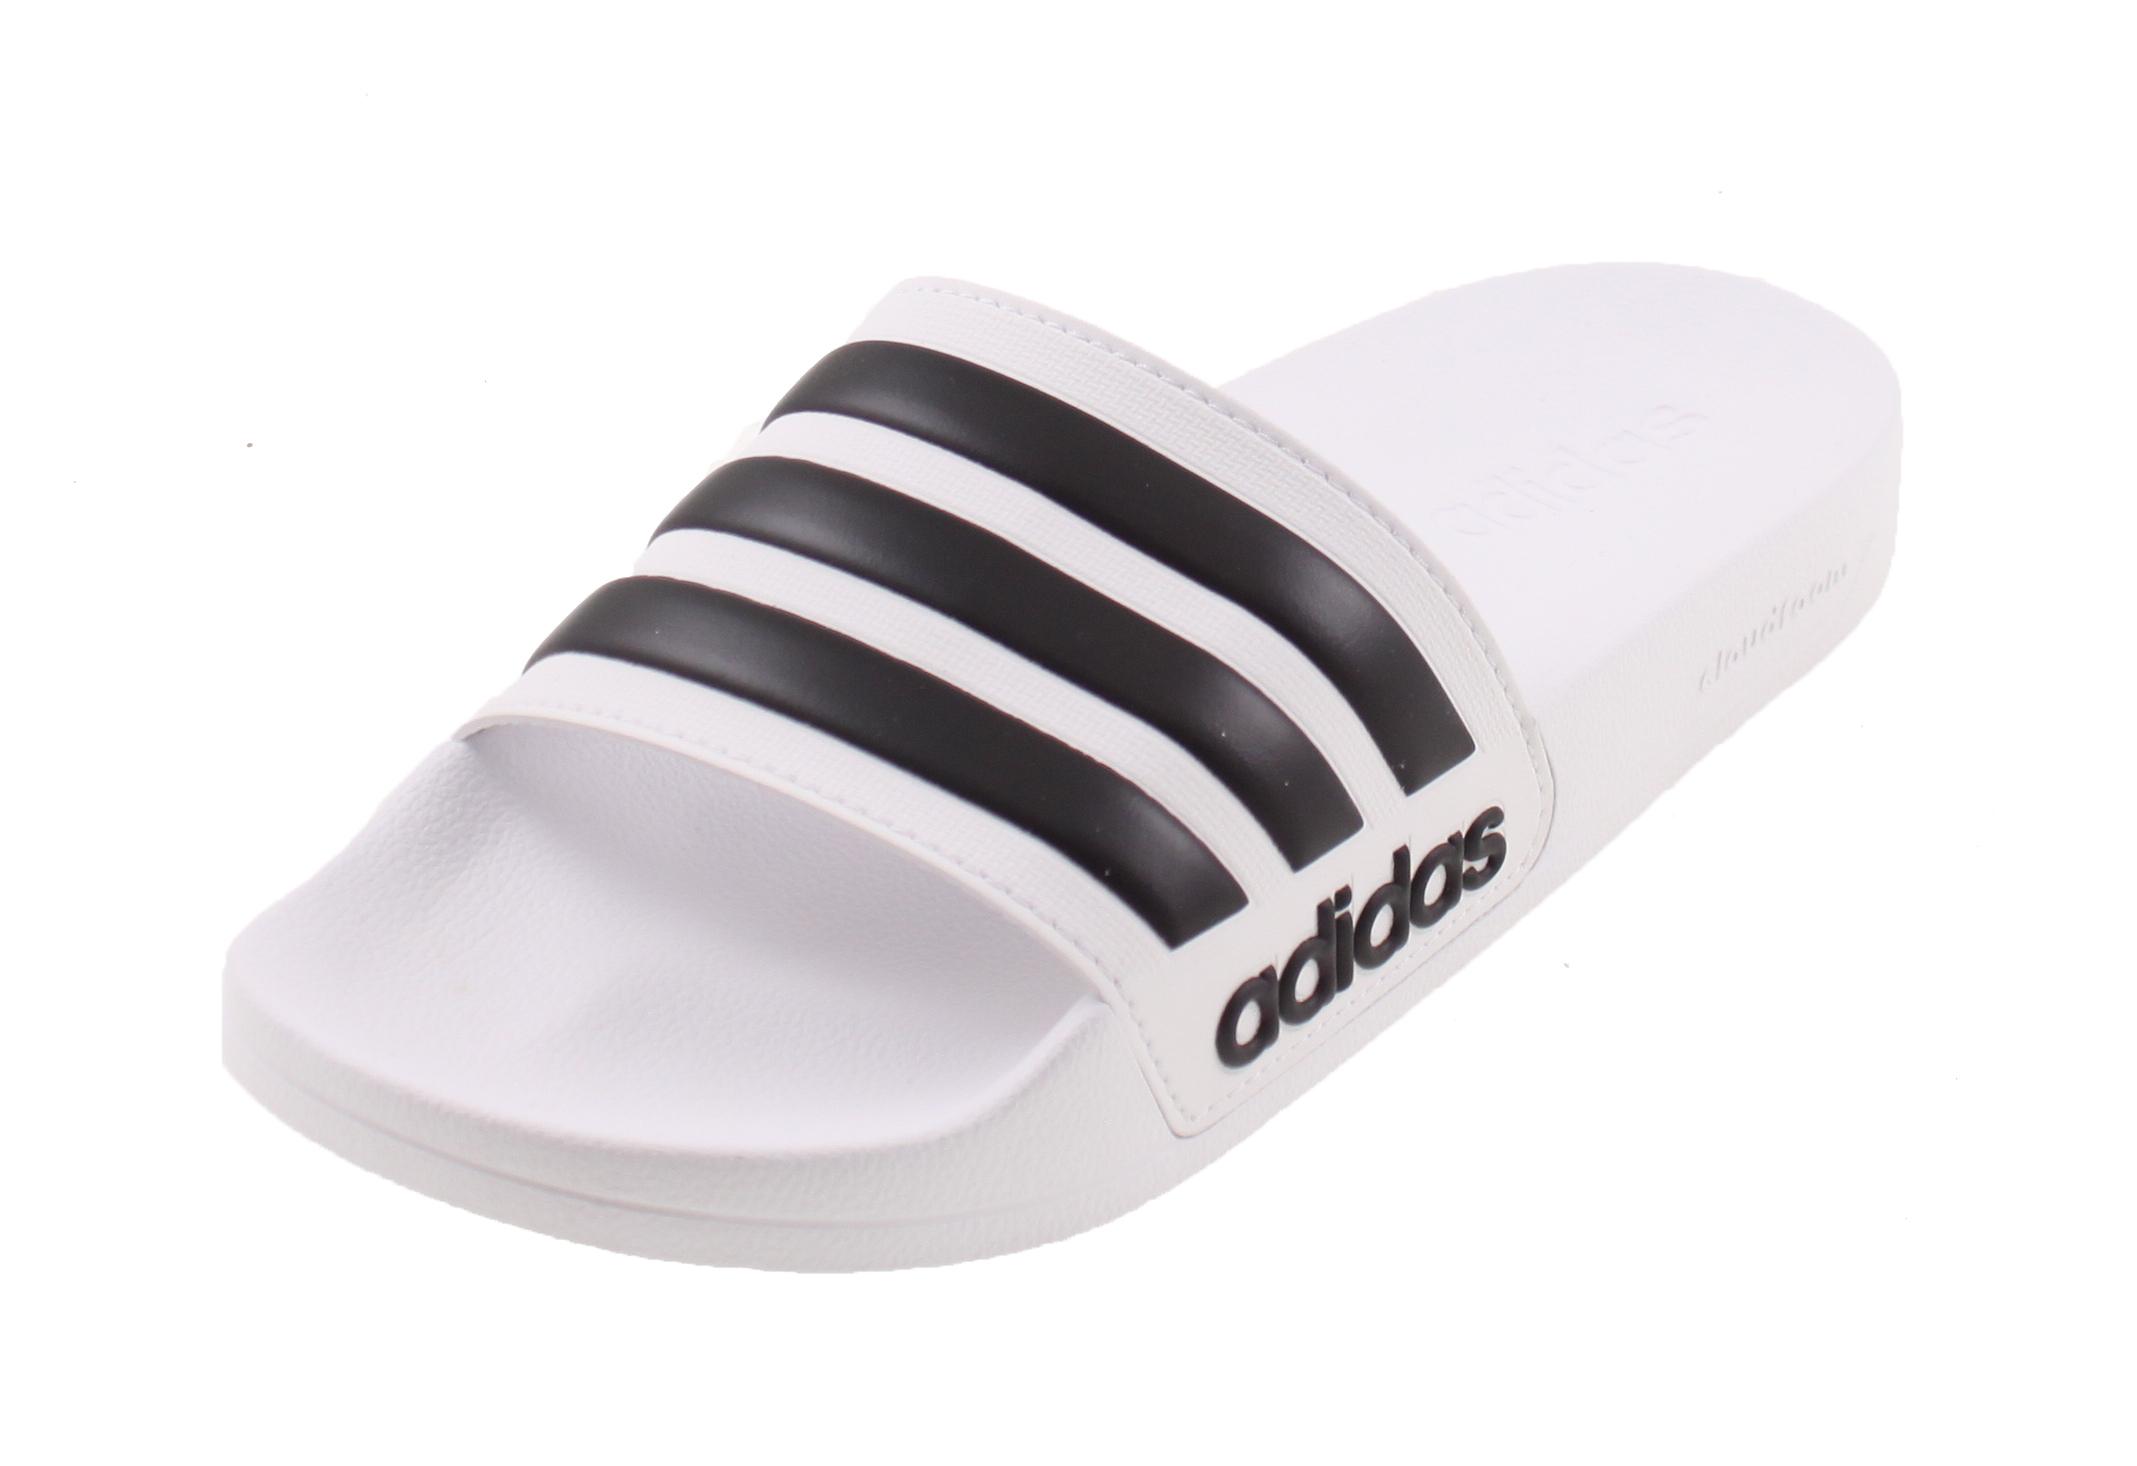 91a973f436c2ad Adidas Adilette Cloudfoam Badslipper ...